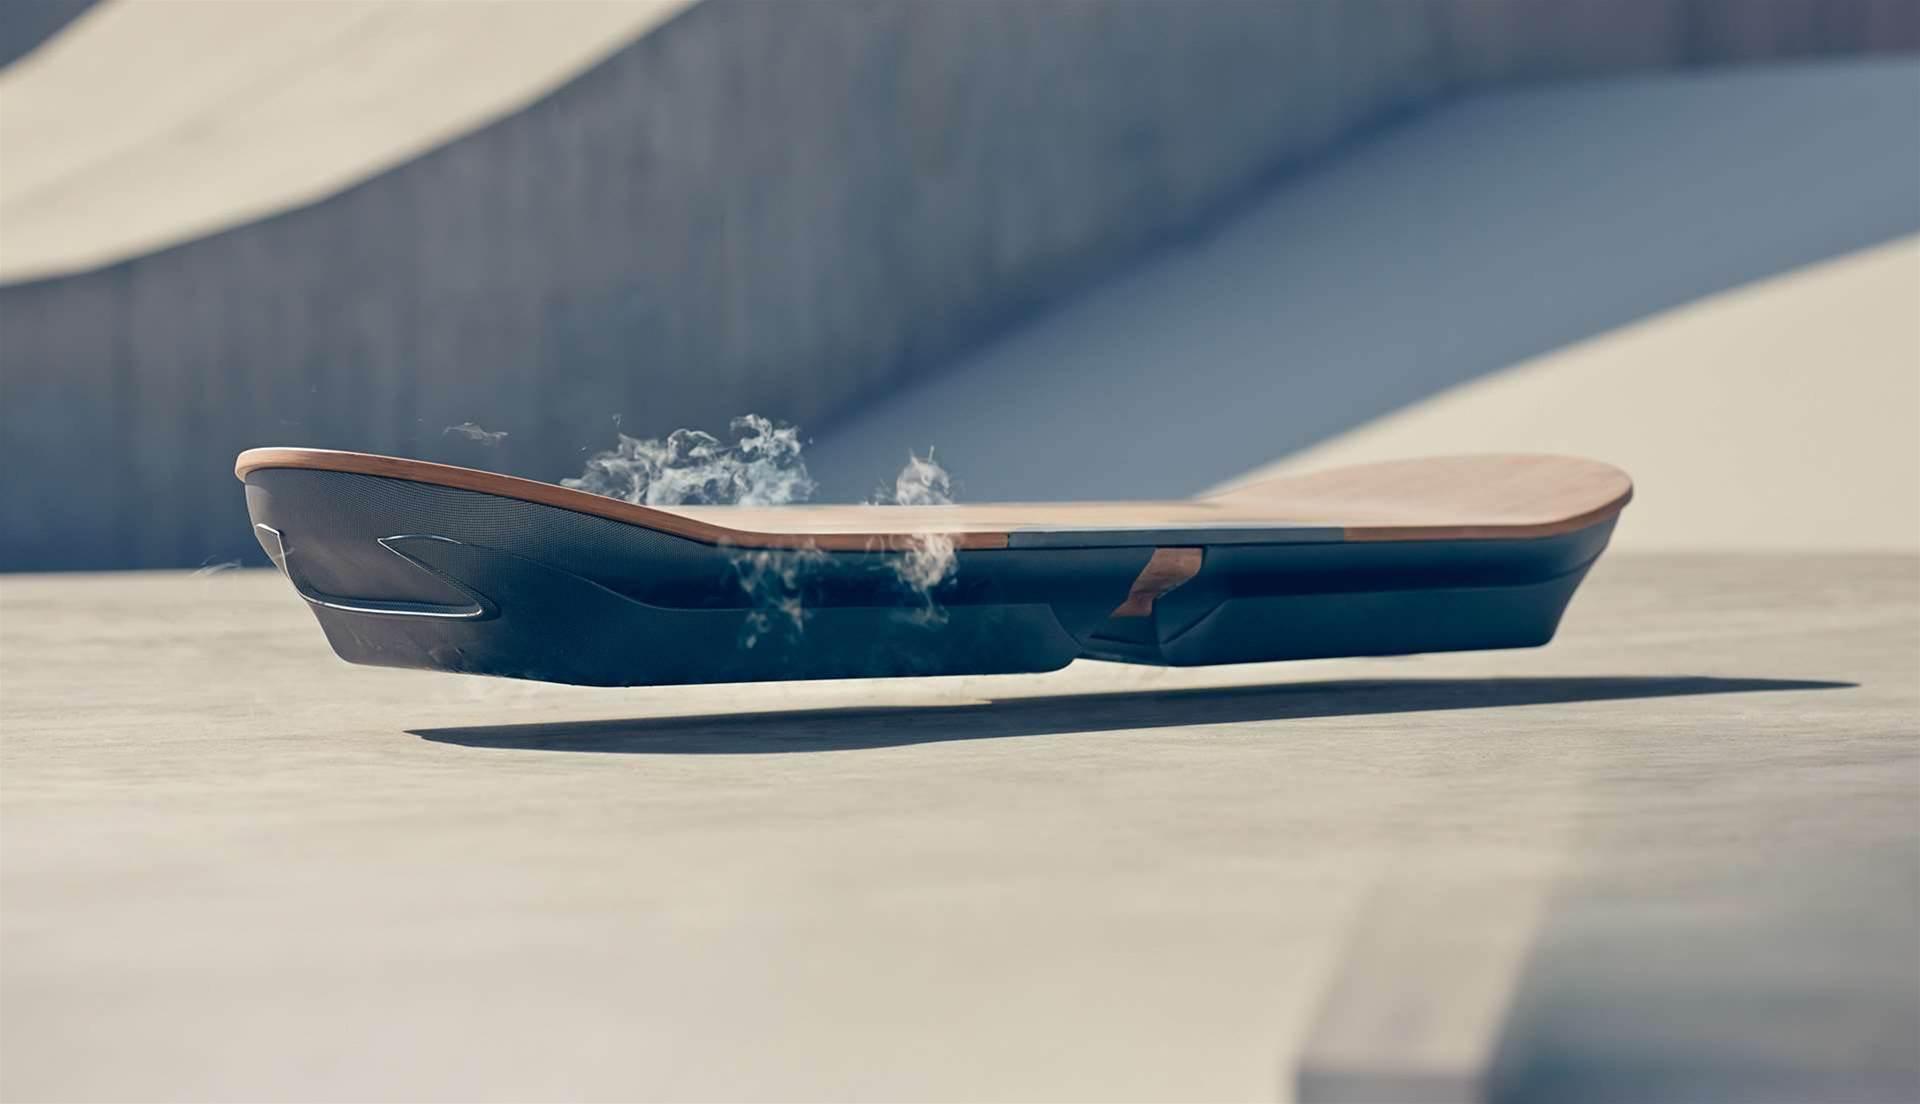 Lexus Unveils The Lexus Of Hoverboards